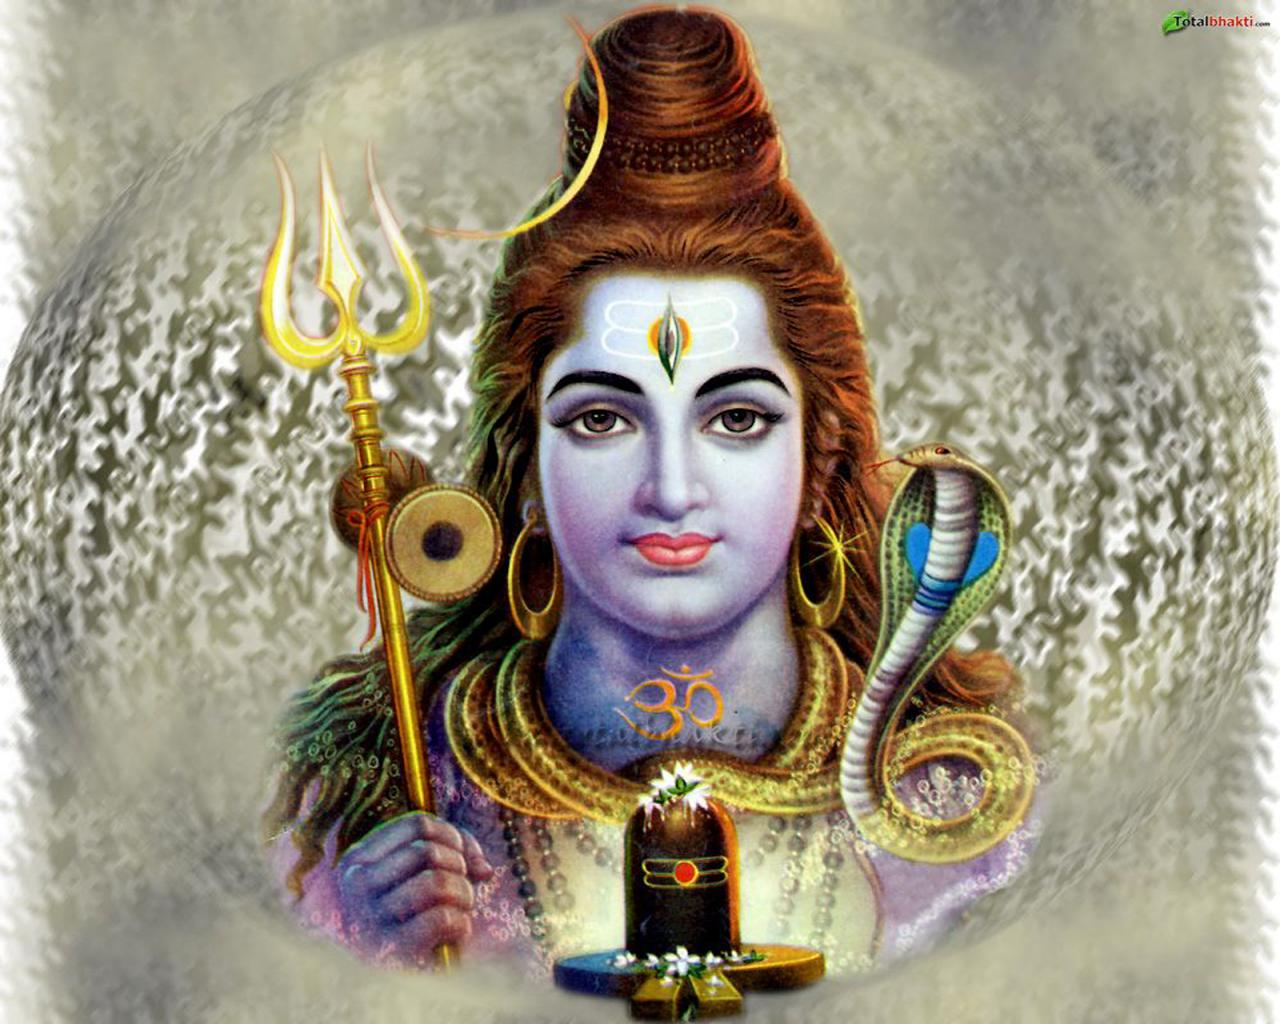 FREE Download Shiv Parivar Wallpapers | Shiv Parivar